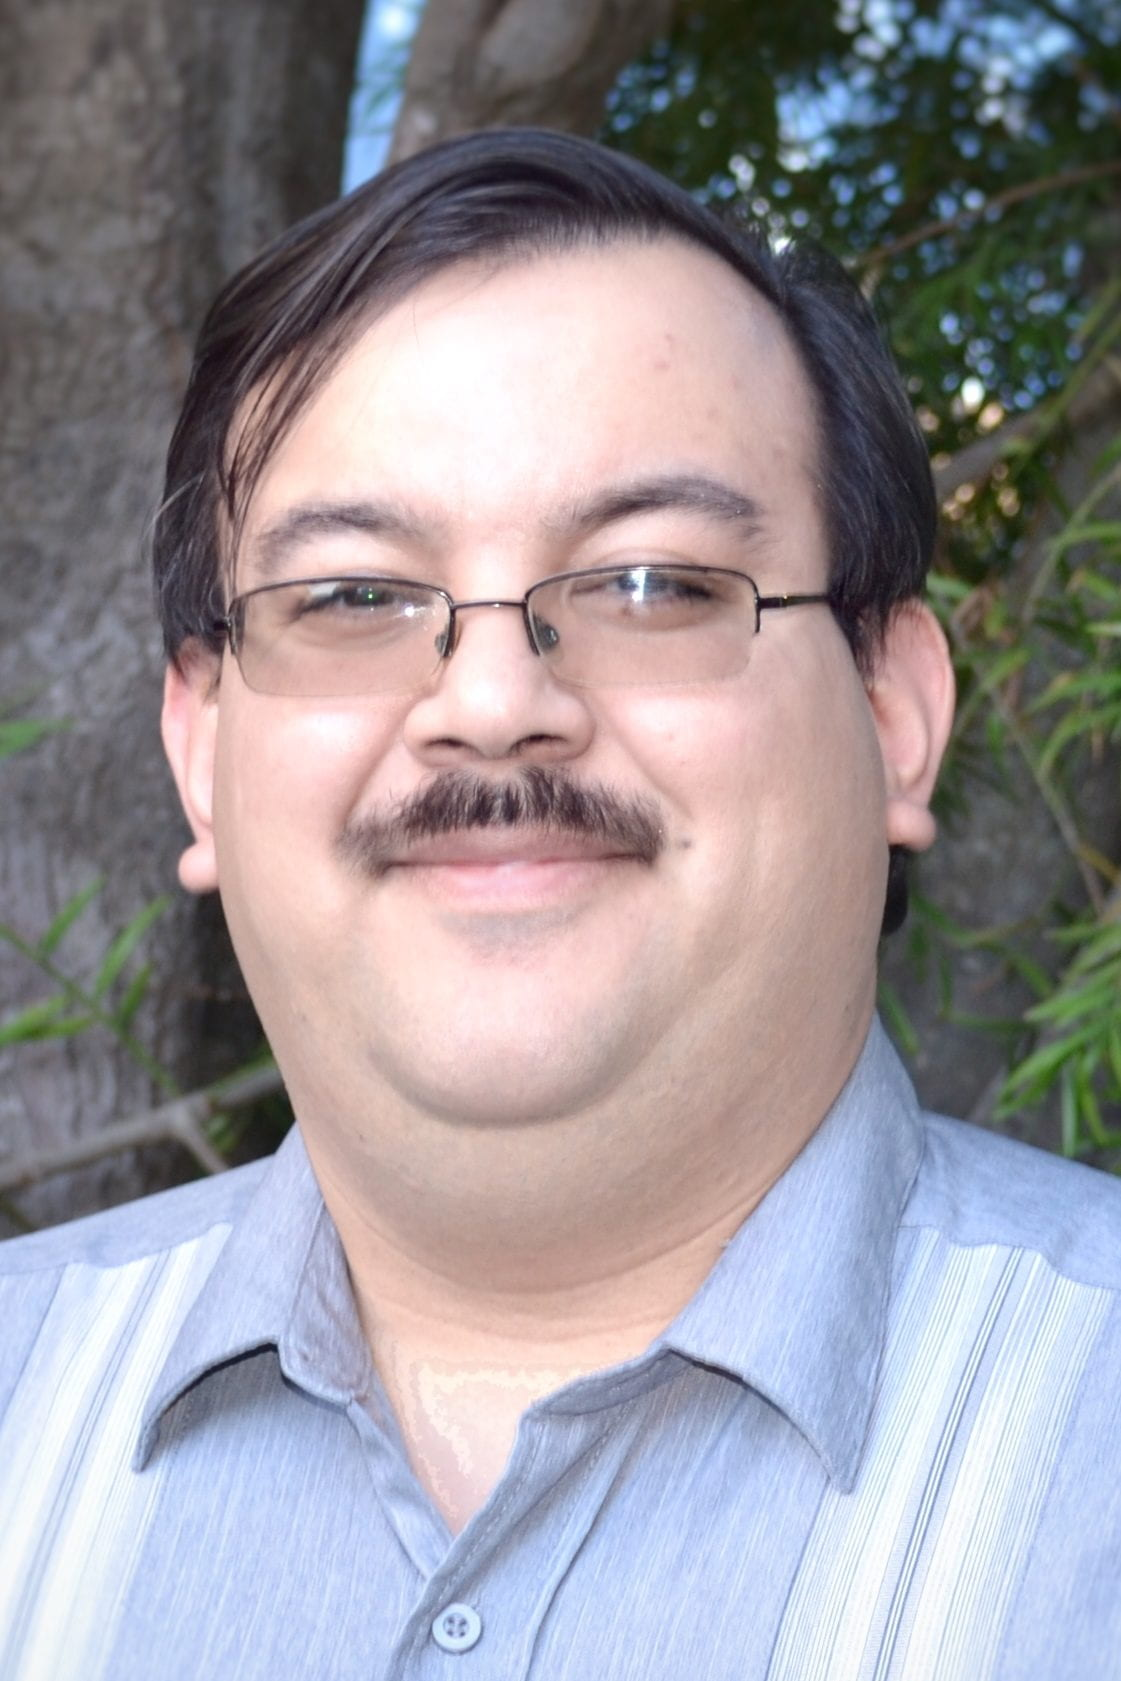 Edgar Meza Cabrera